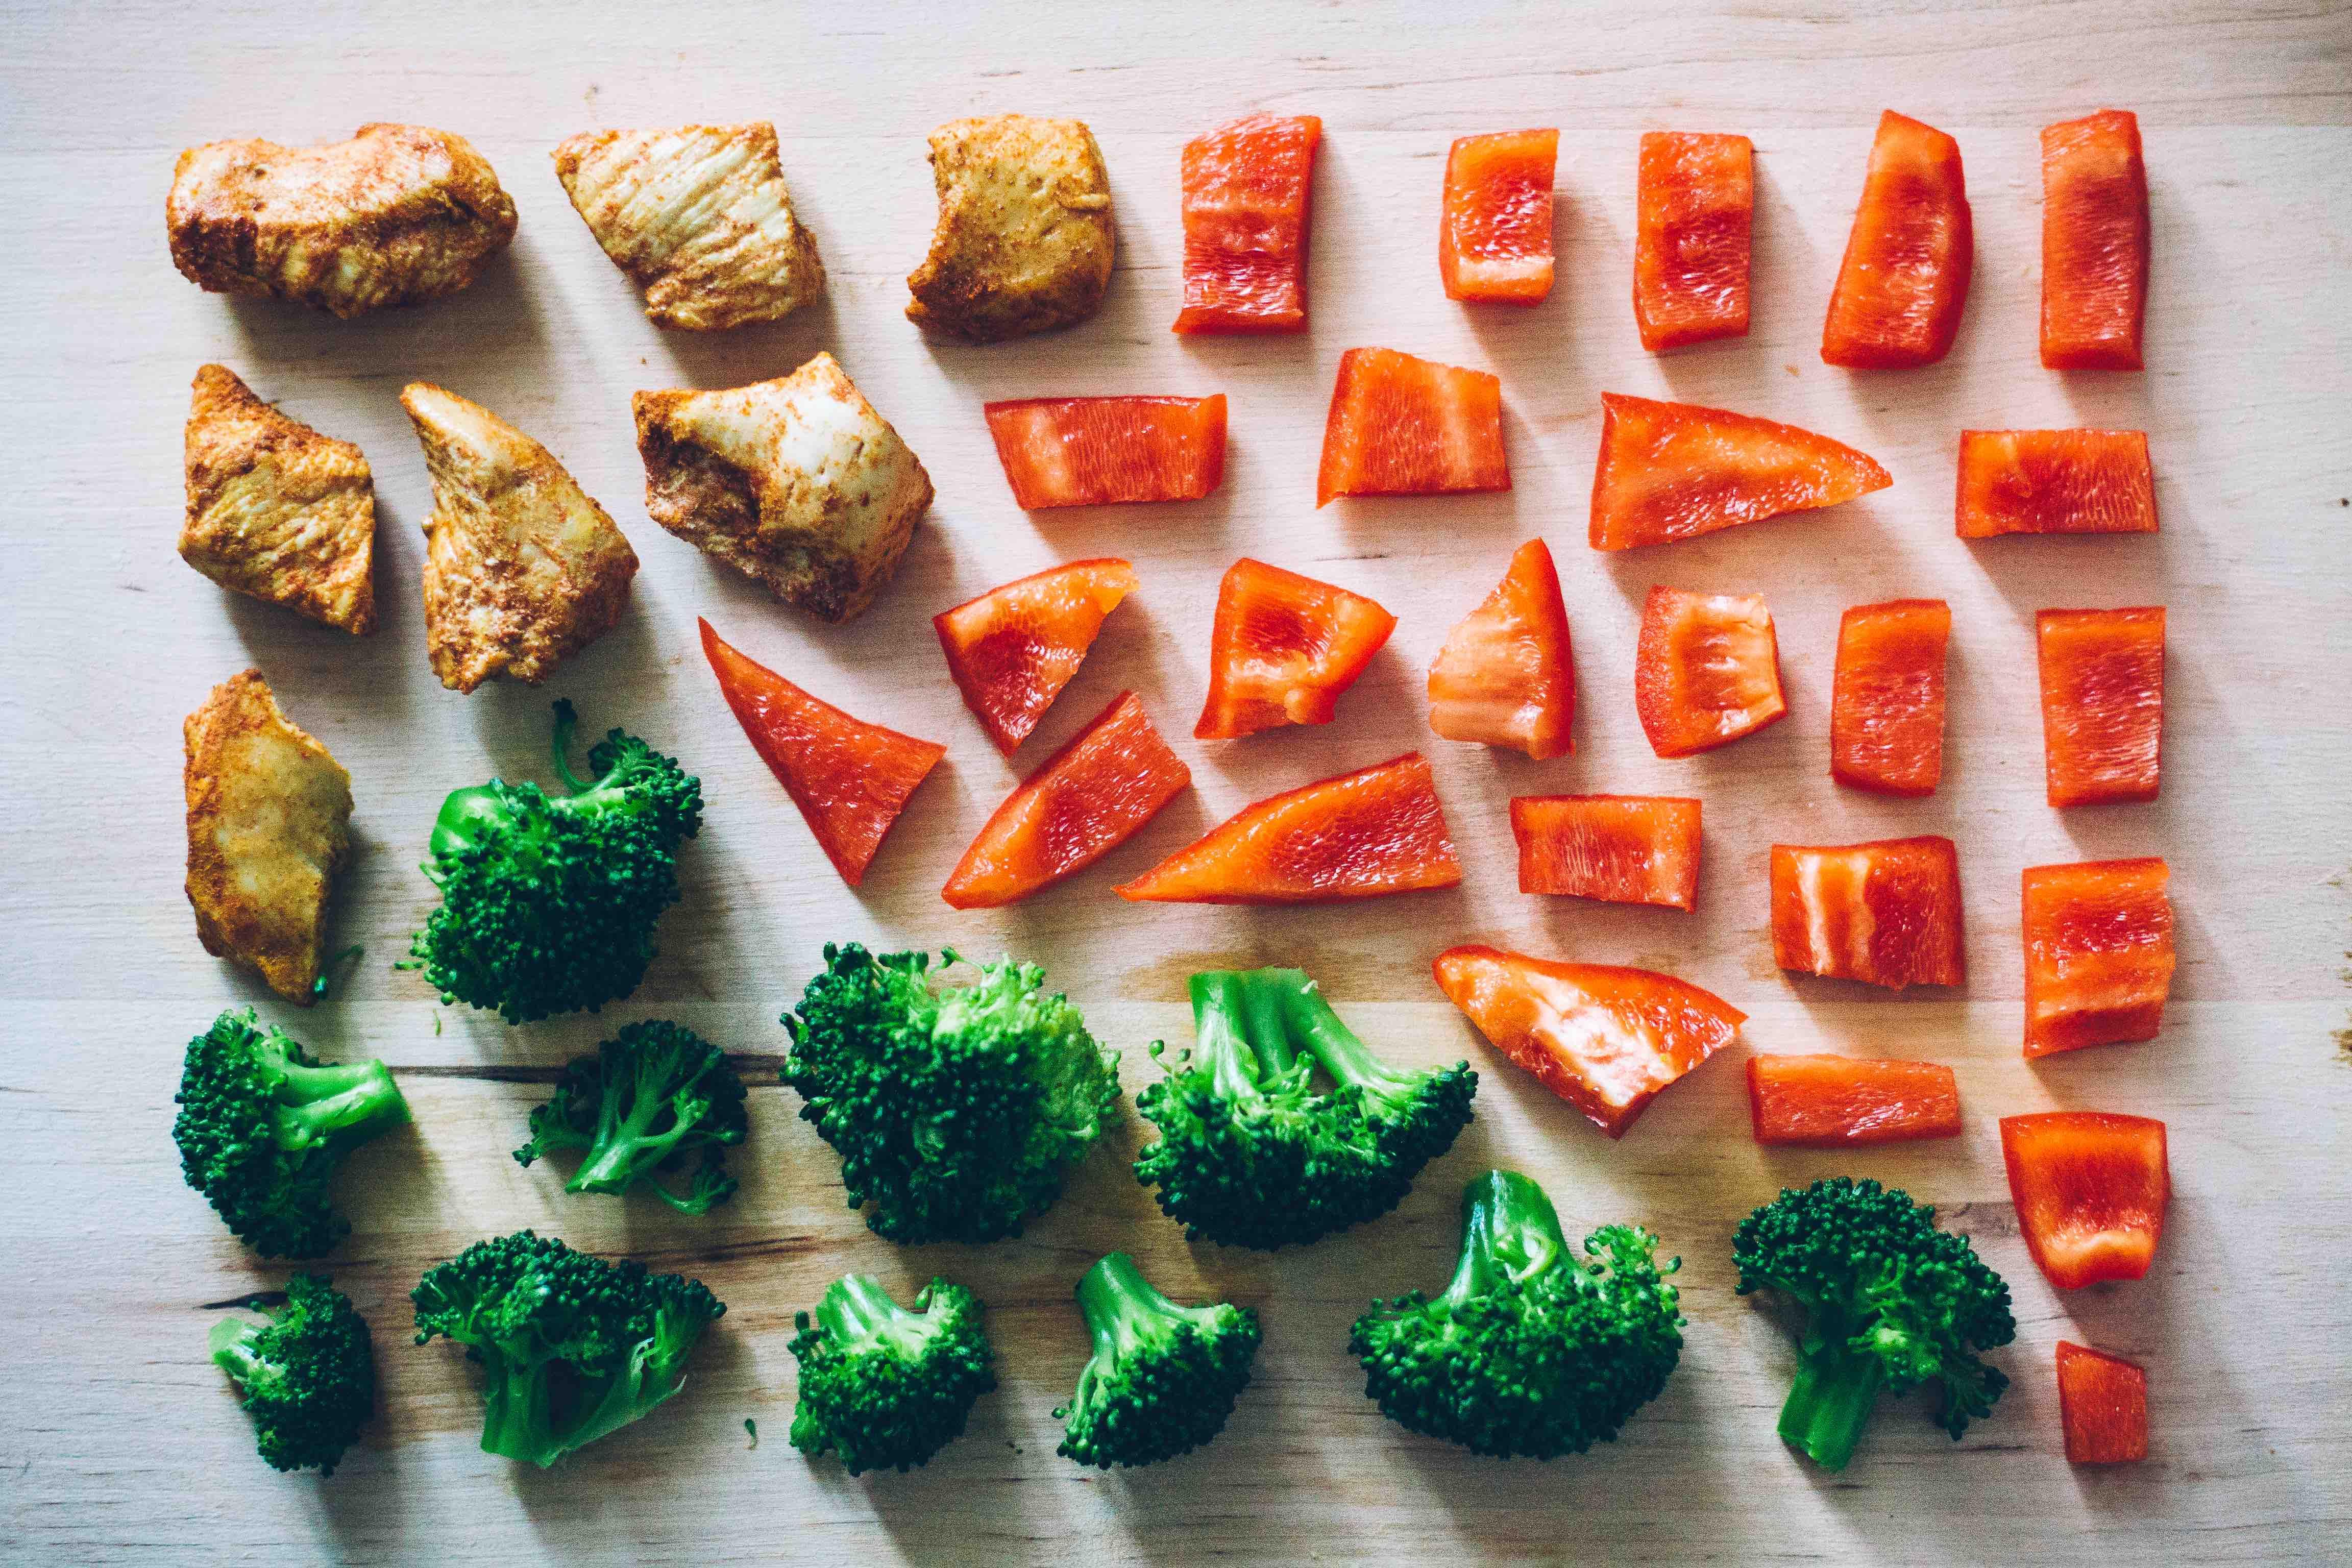 Kosthold ernæring ernæringsfysiolog